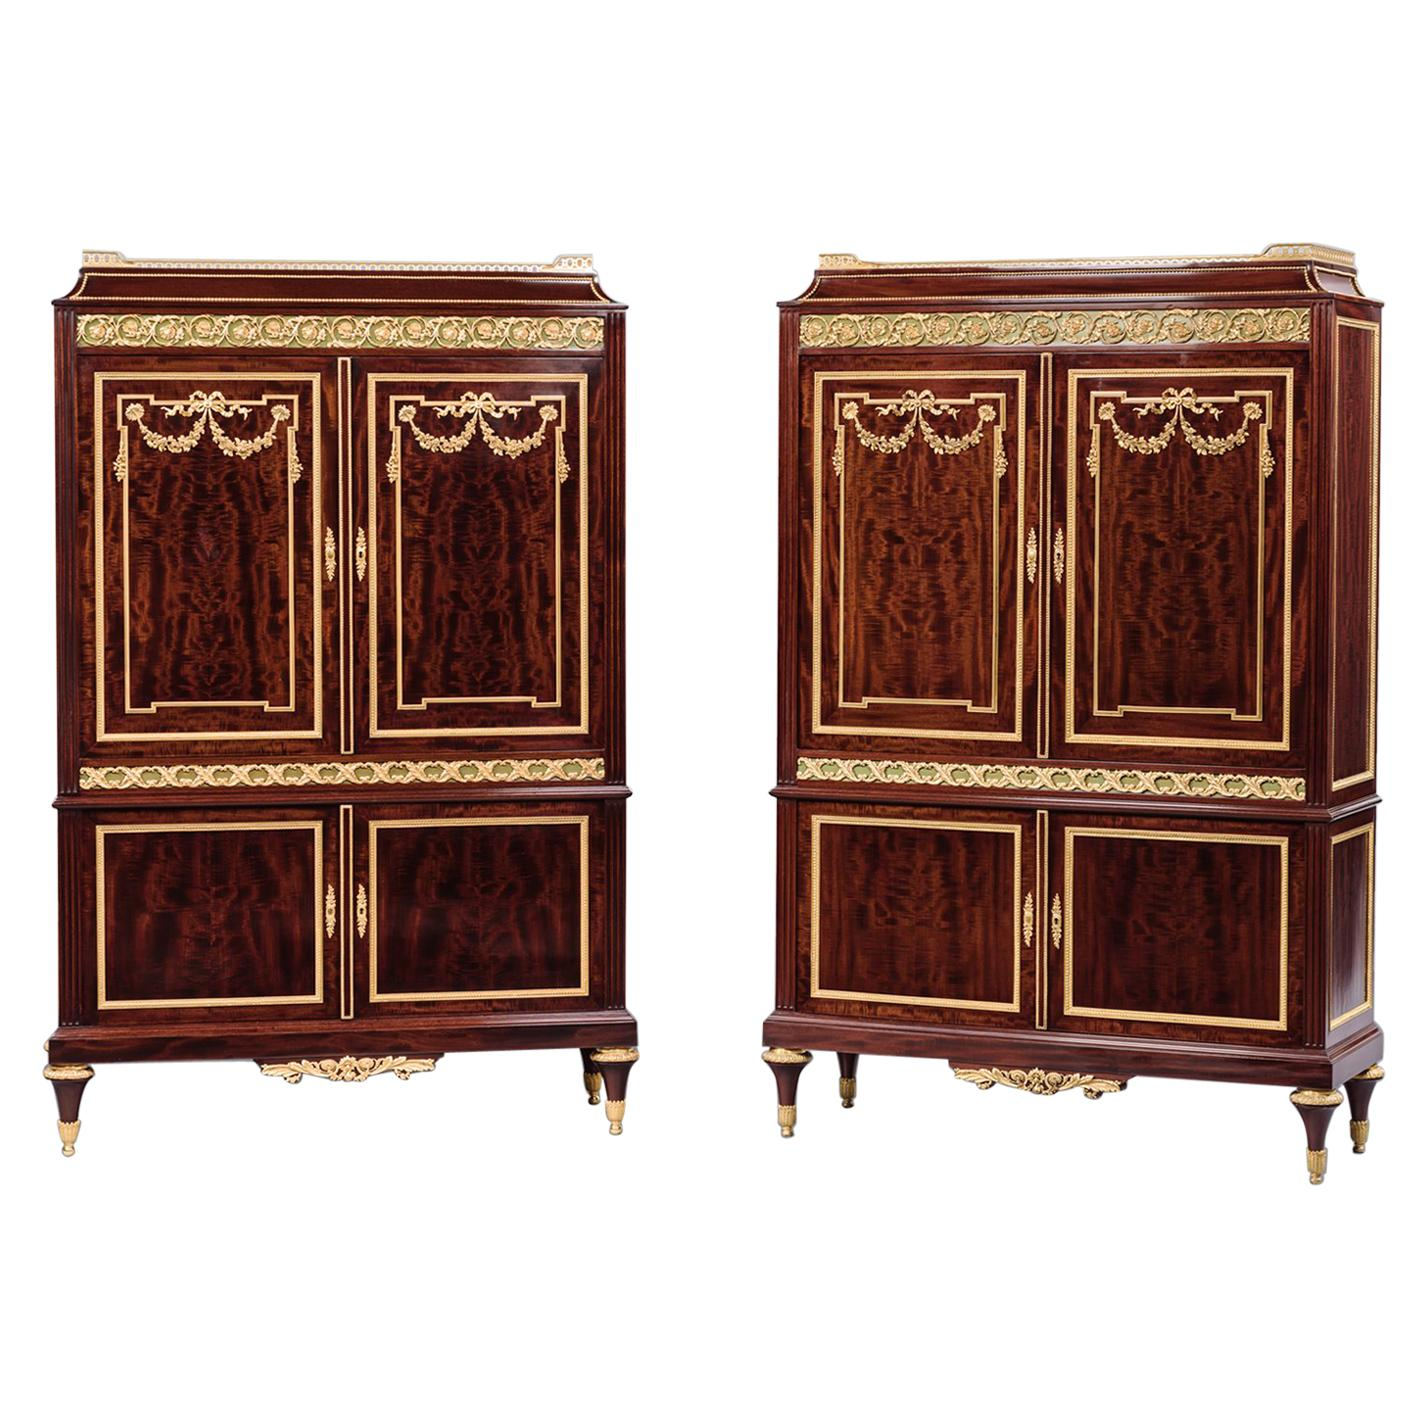 Fine Pair of Louis XVI Style Mahogany Cabinets by Paul Sormani, circa 1870